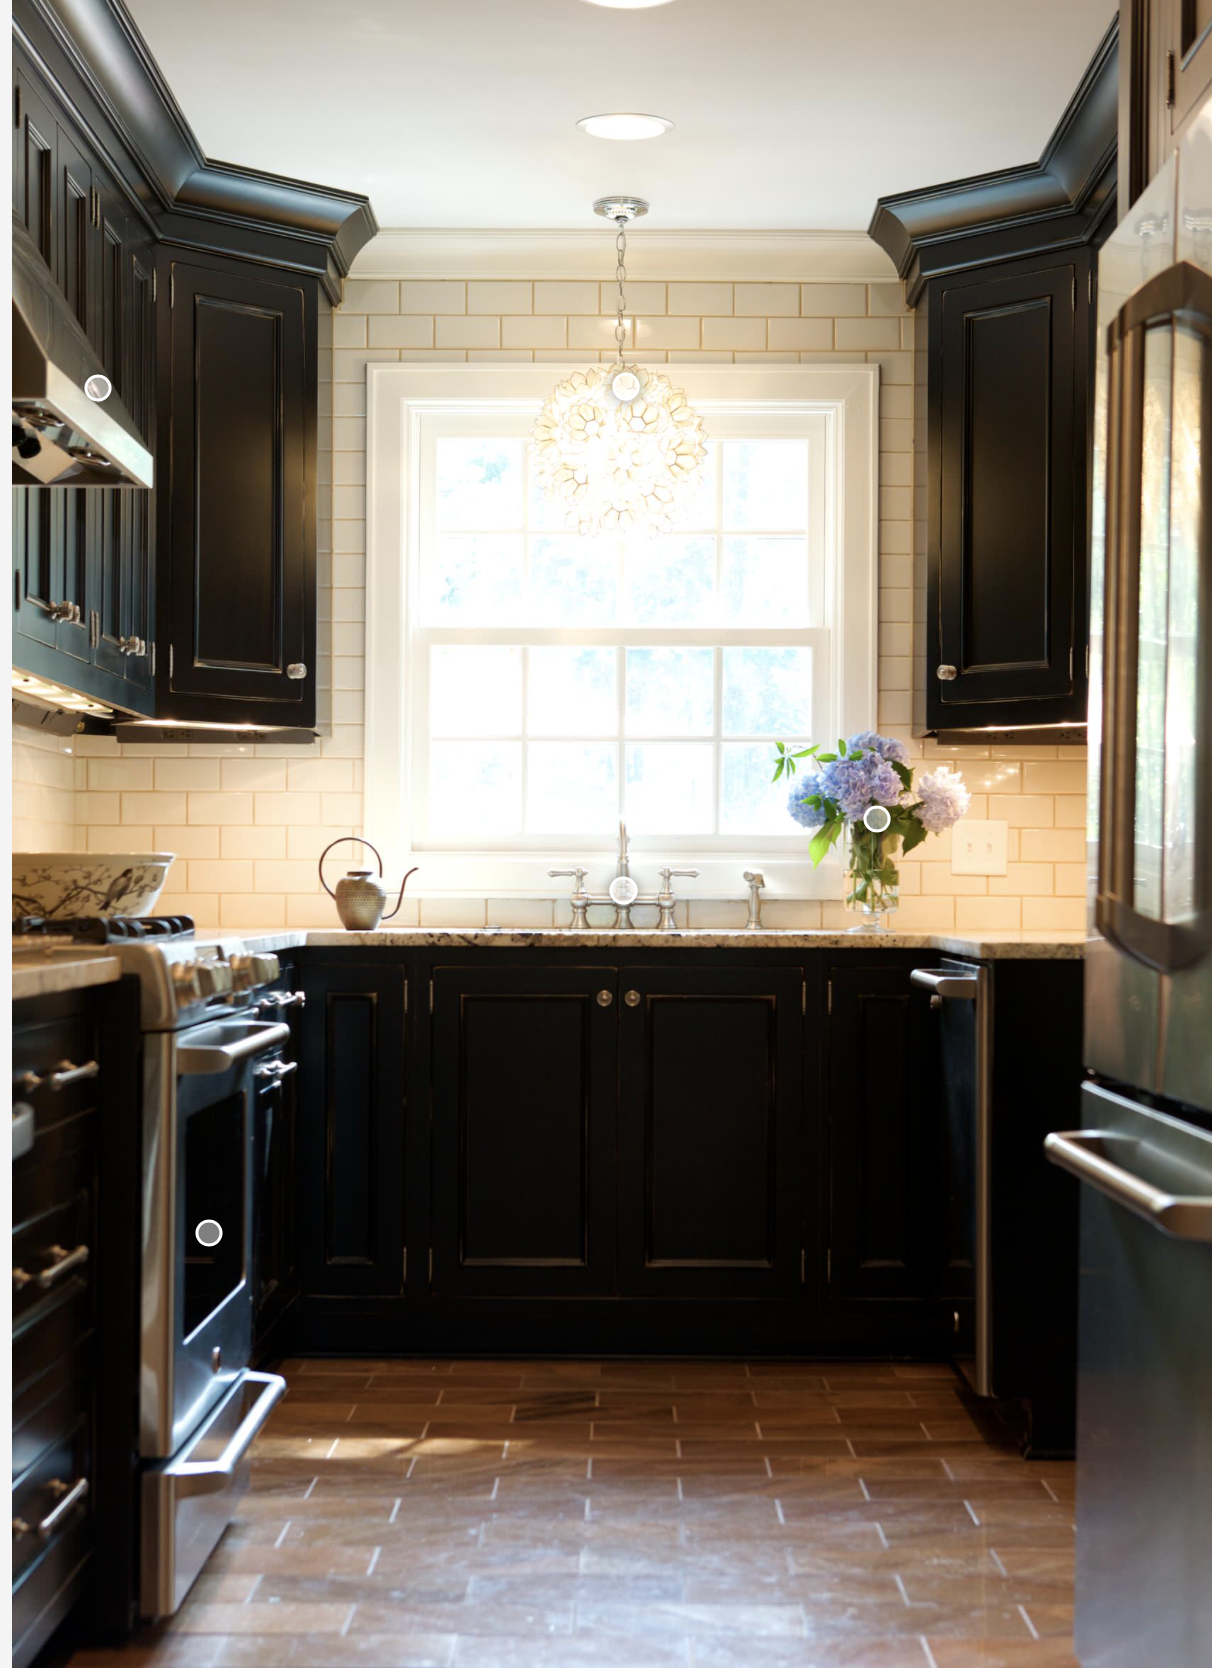 white tile backsplash, mahogany cabinets, brown granite ...